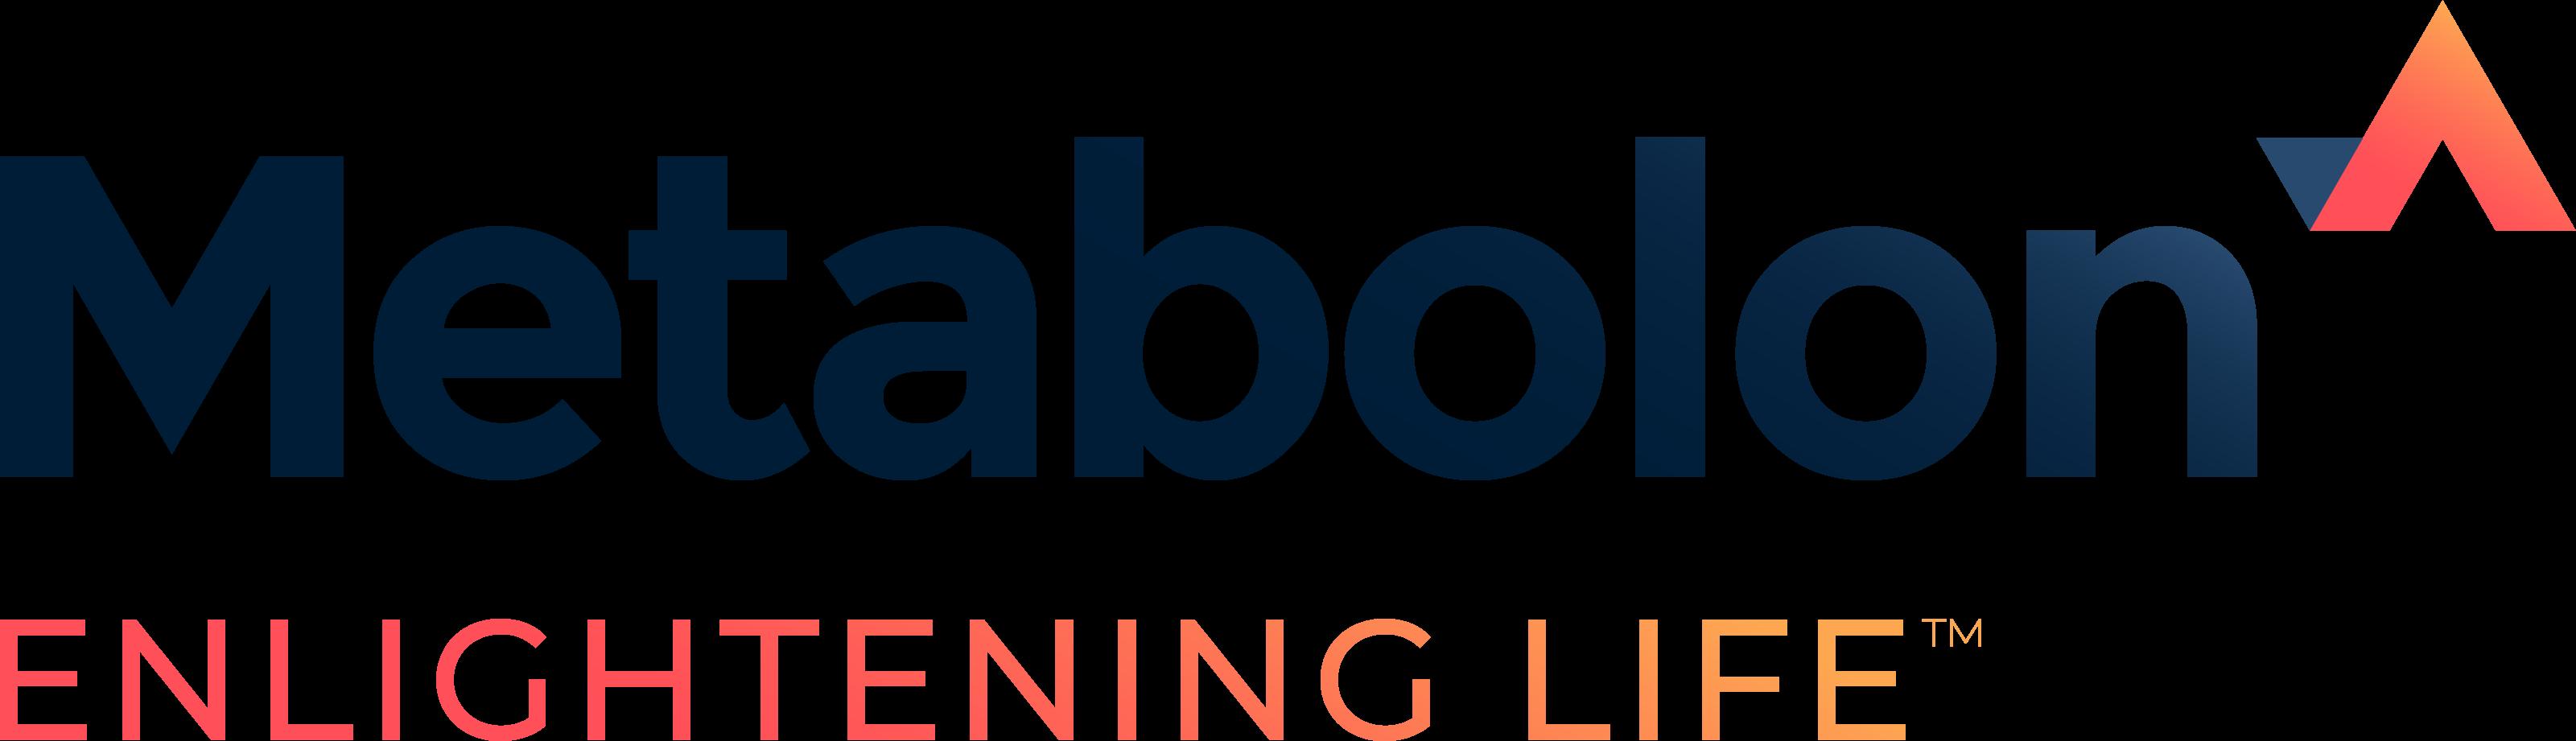 Metabolon-FullC-Logo-EL-Md@2x